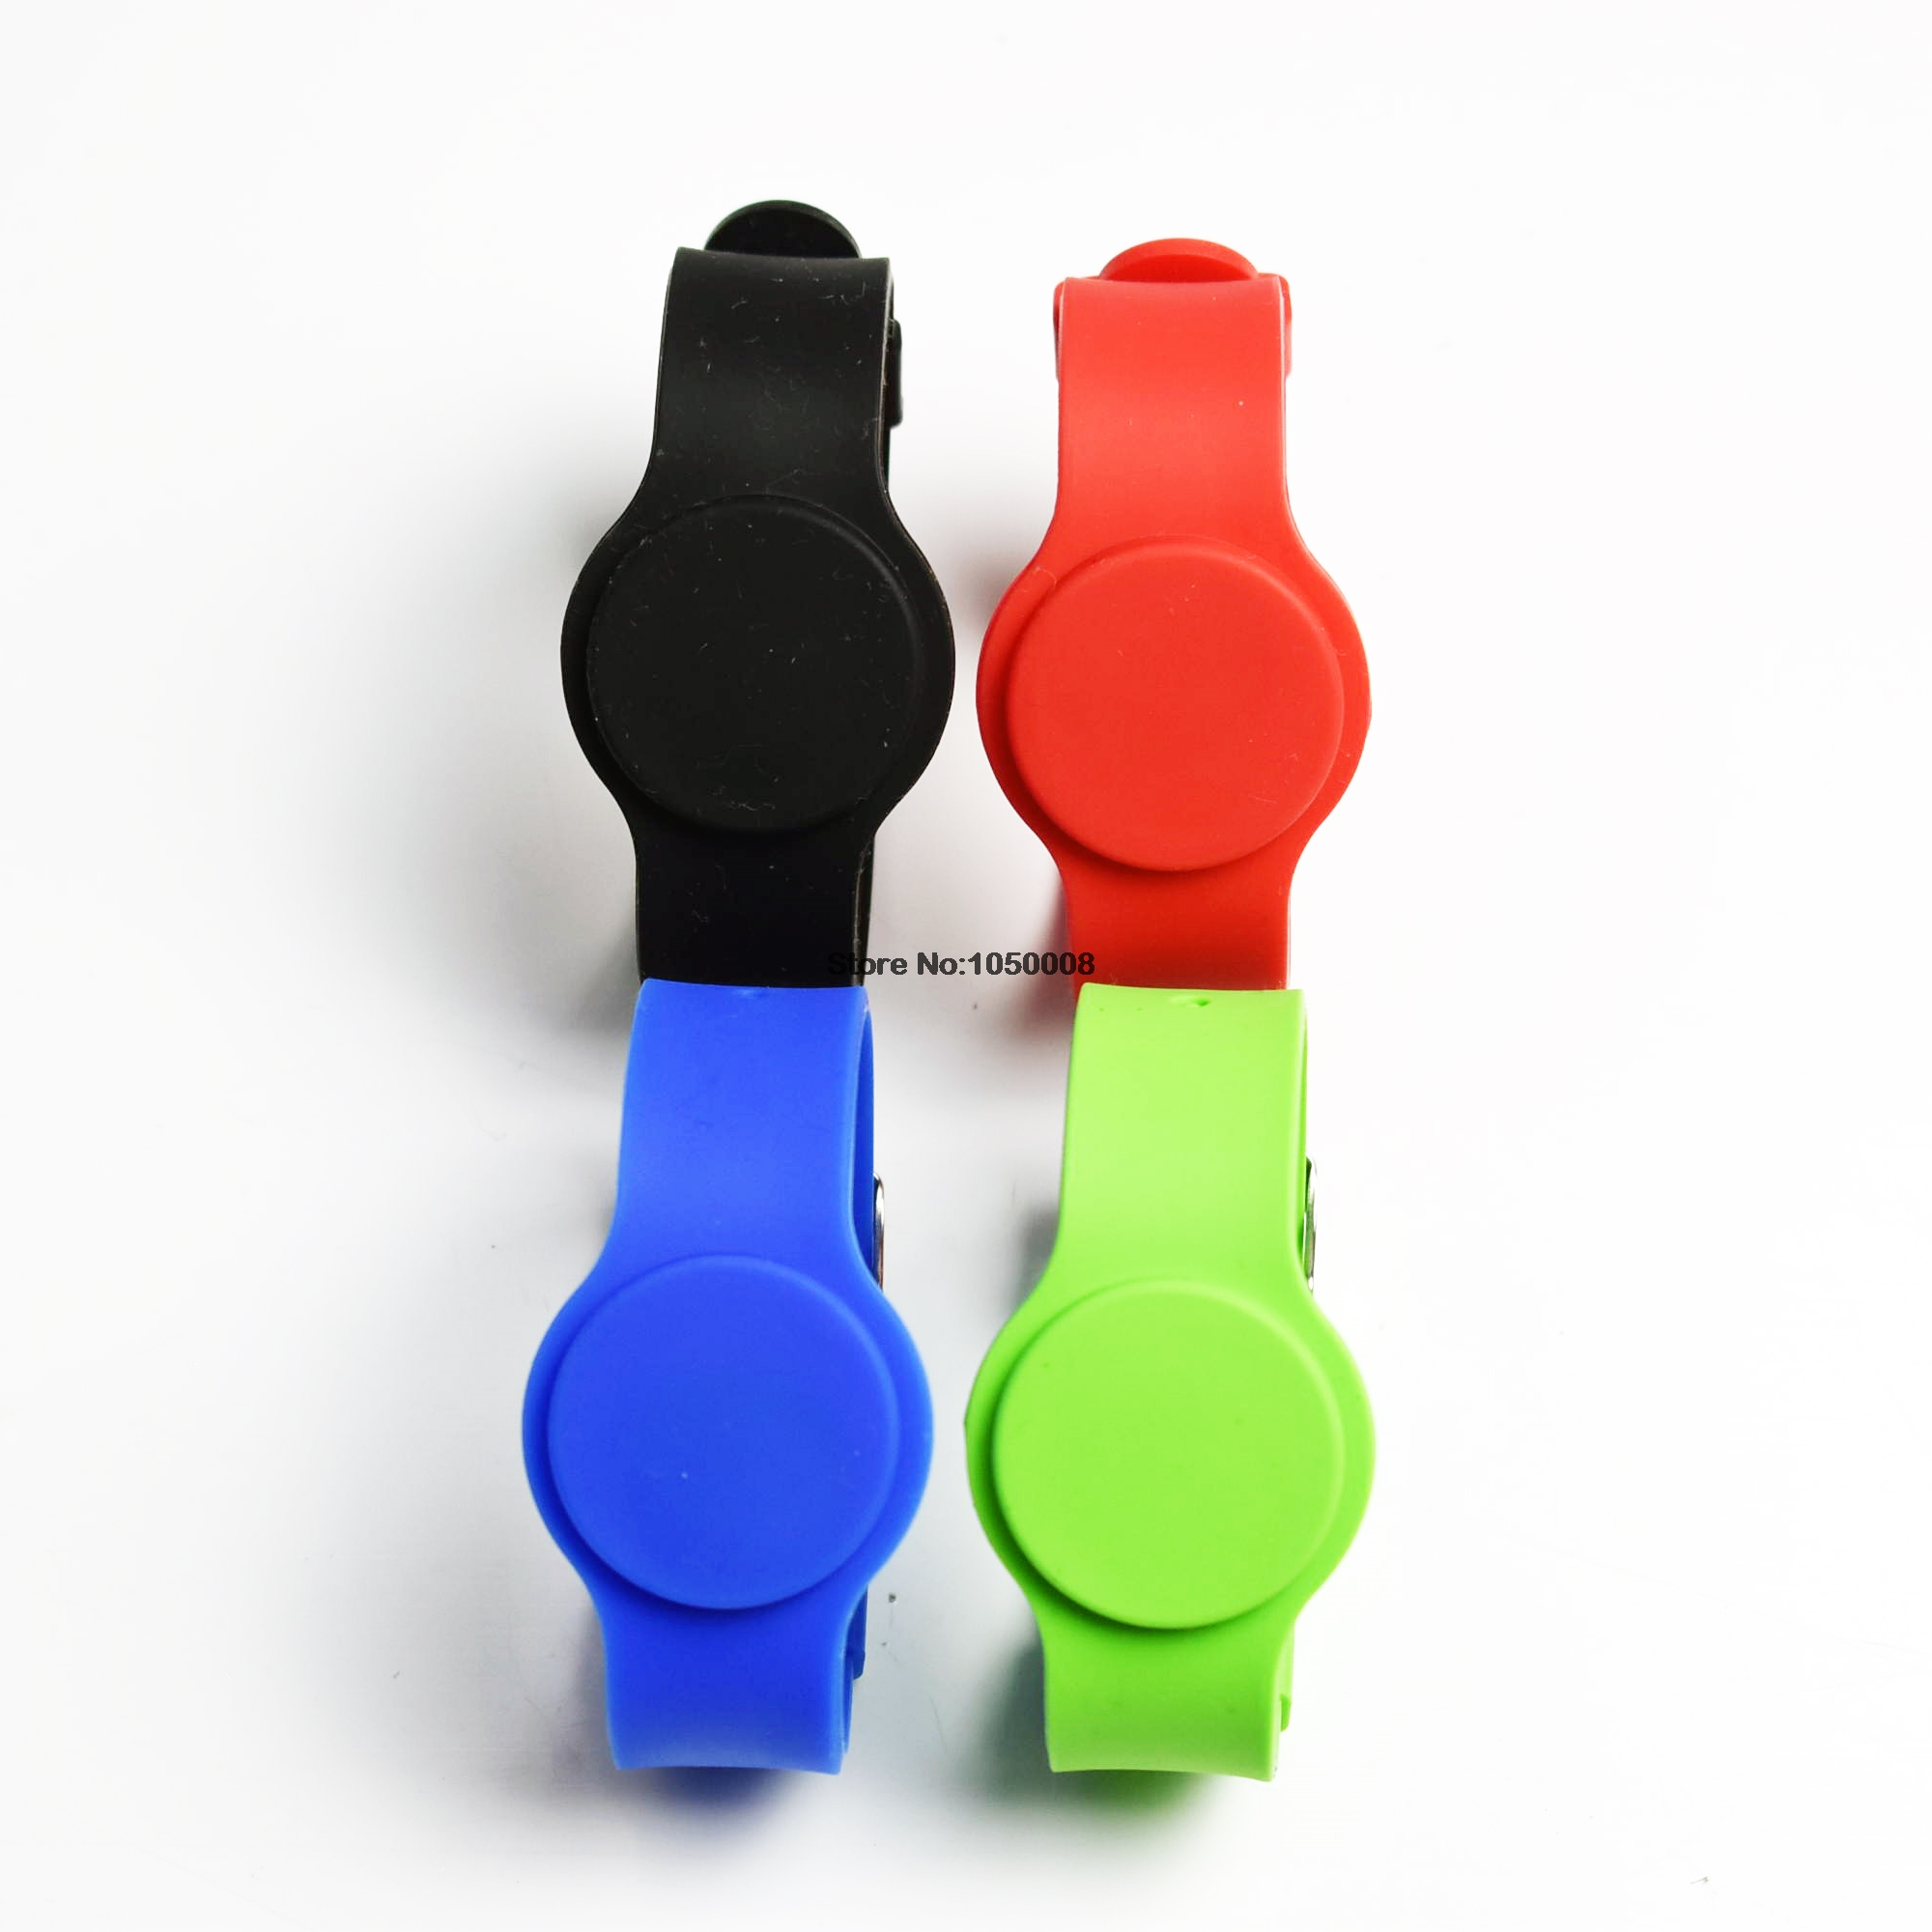 50pcs 13.56Mhz UID Changeable MF 1K S50 NFC Bracelet RFID Wristband Chinese Magic Card Back Door Rewritable S50 Card чехол k s kids для k magic